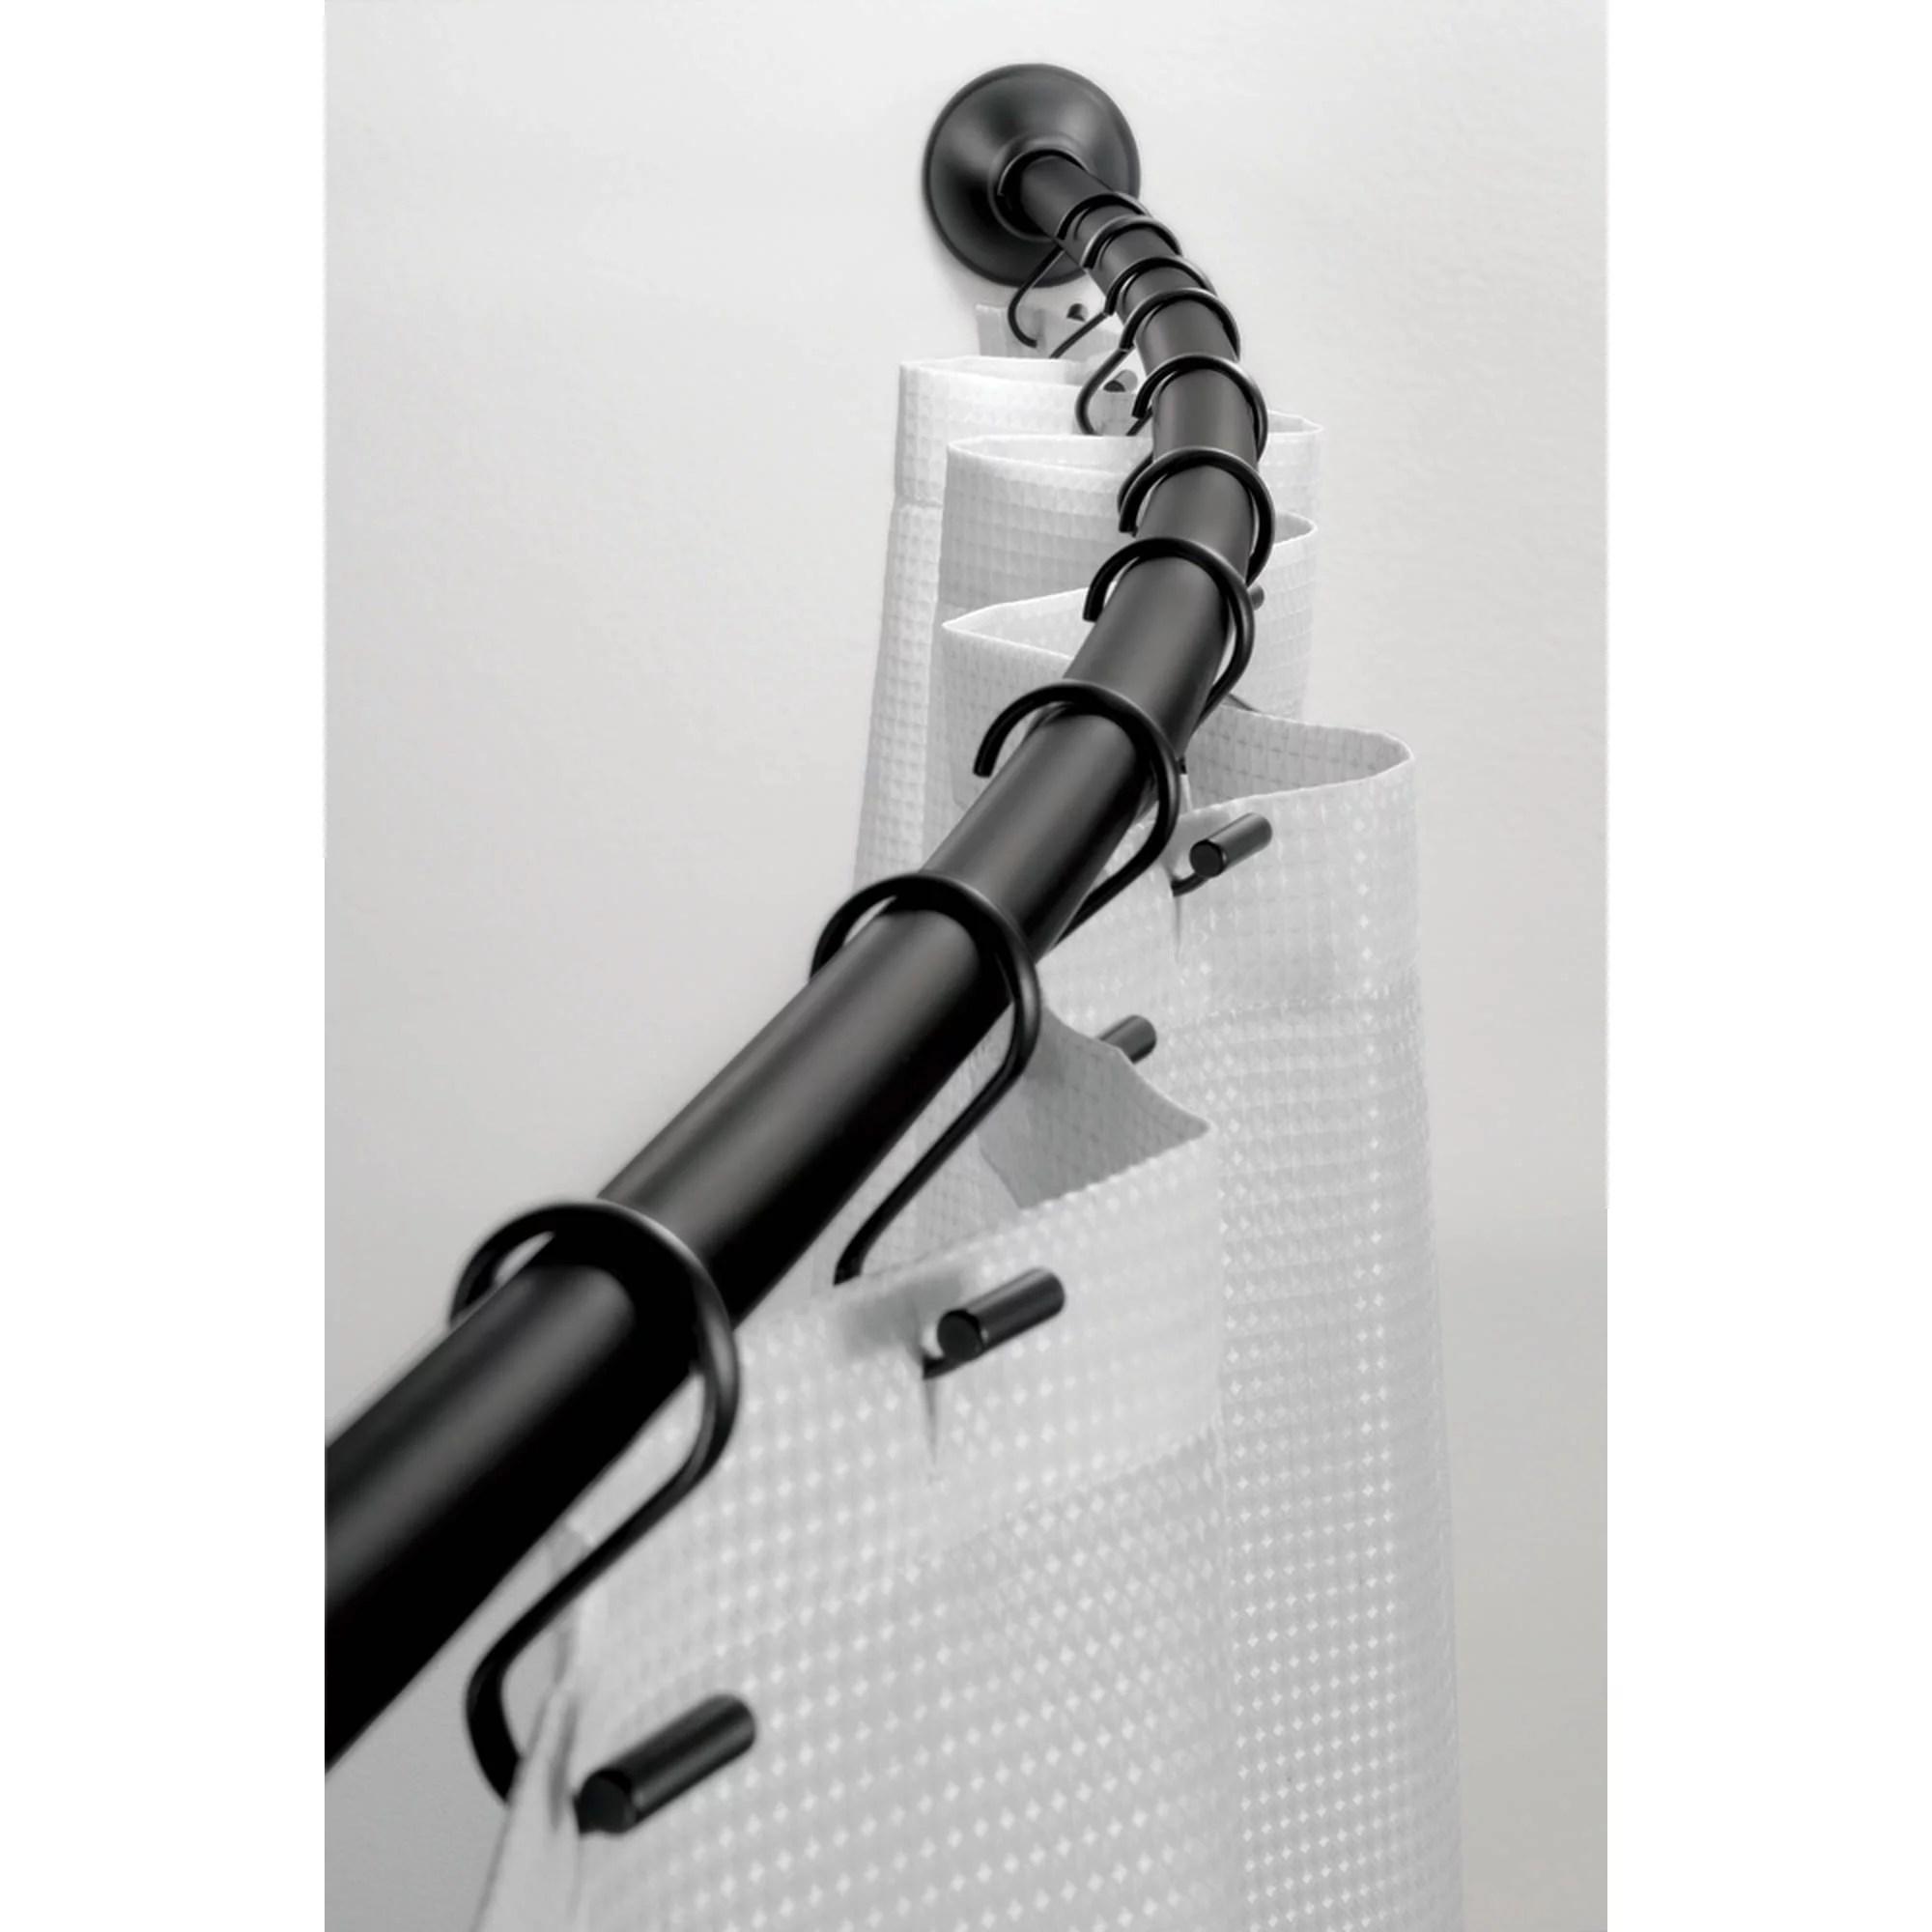 interdesign curved shower curtain rod matte black walmart com